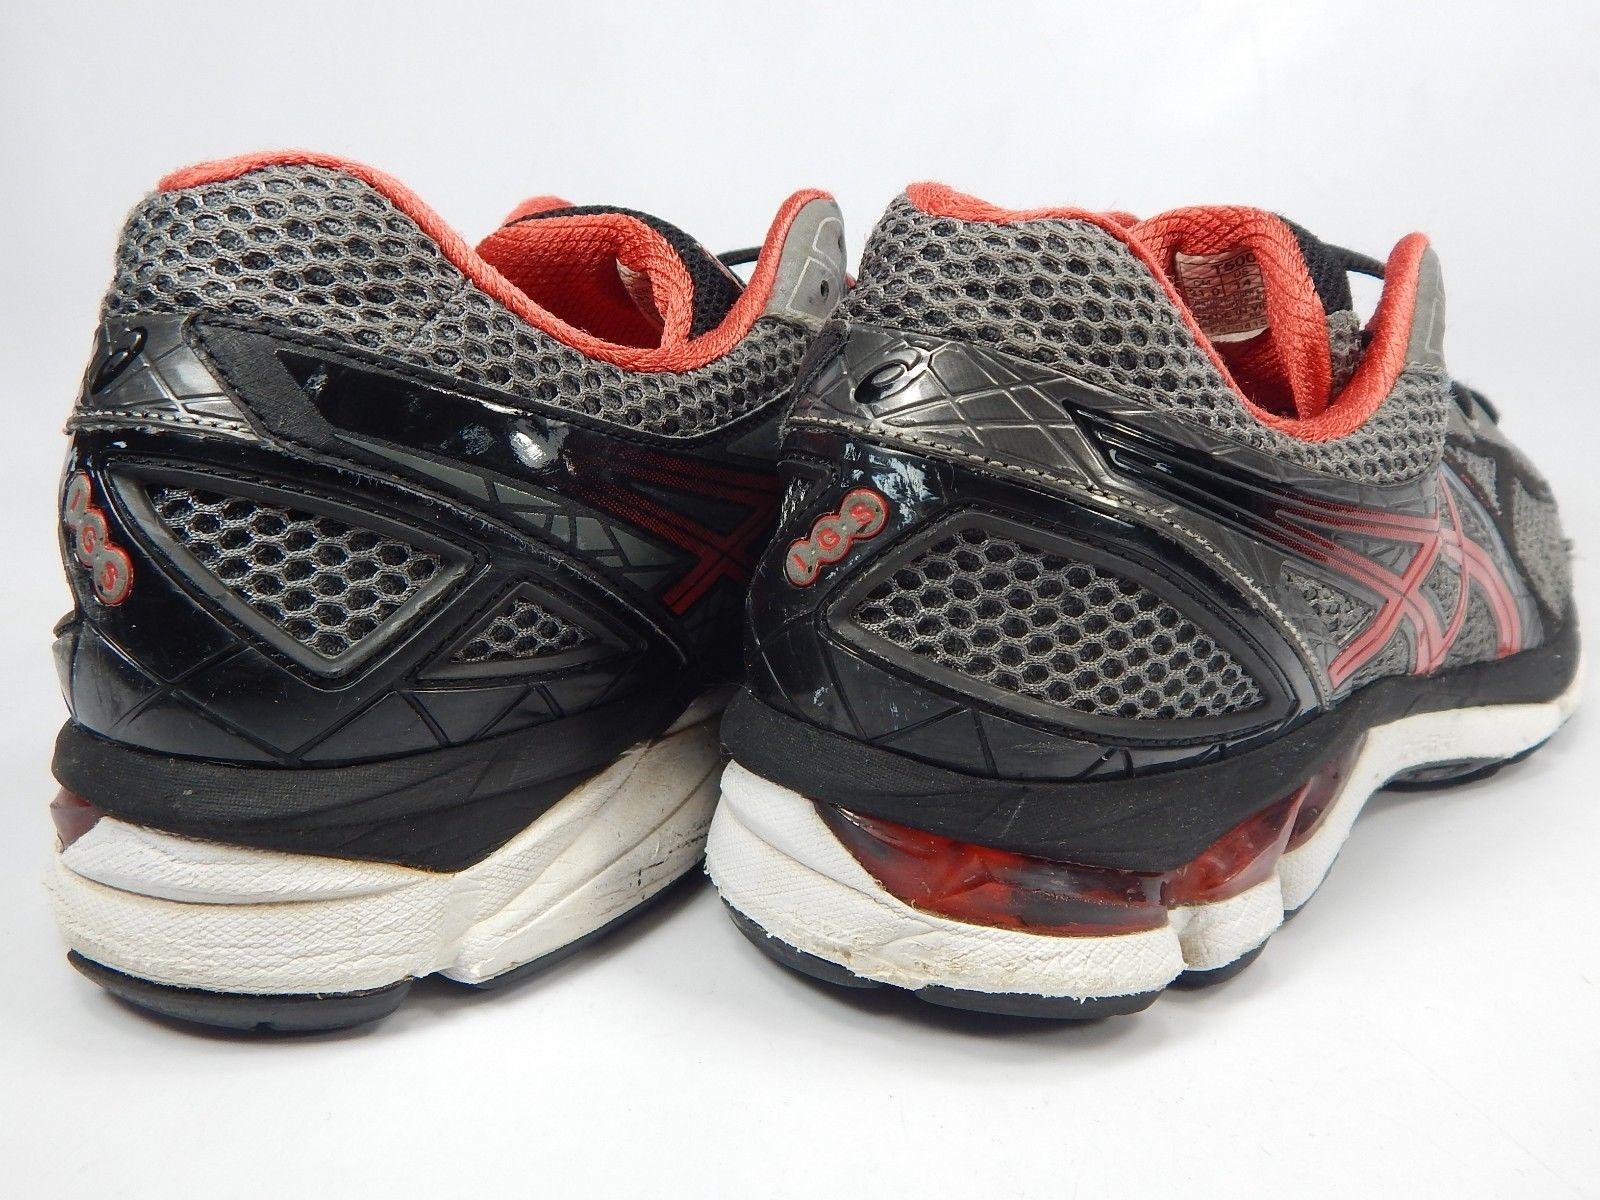 Asics GT 2000 v 3 Size US 14 M (D) EU 49 Men's Running Shoes Gray Red T500N